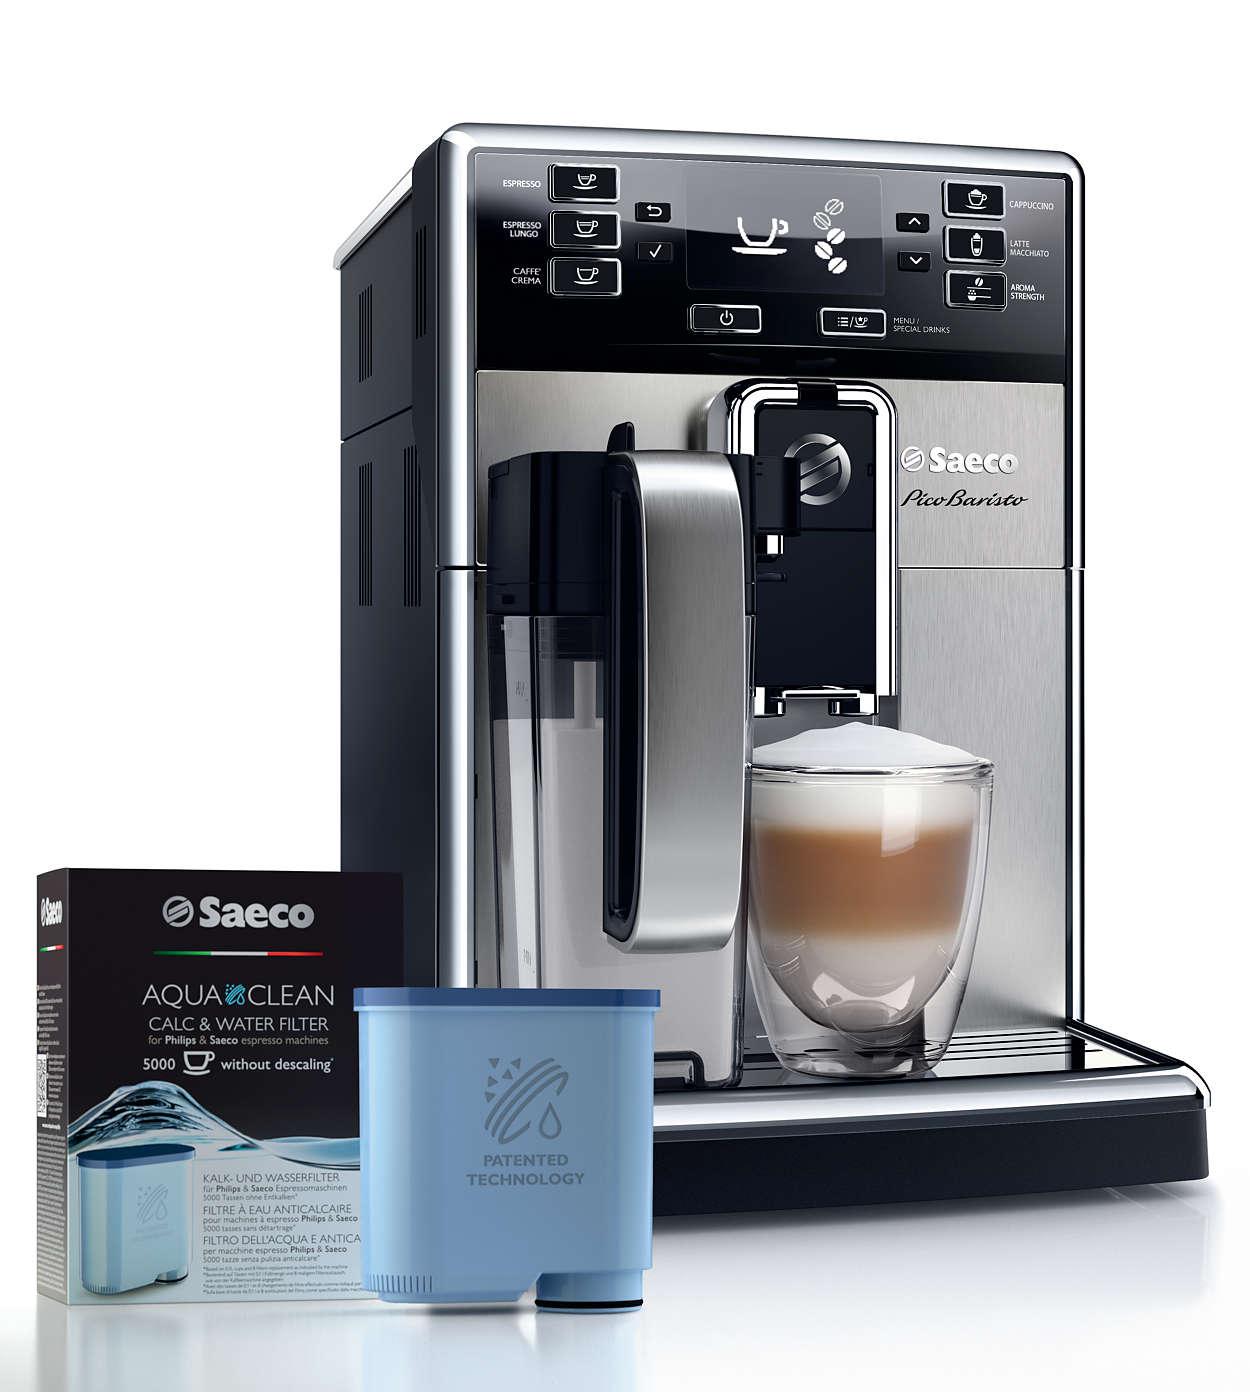 Pico Baristo Saeco Philips Automata kávégépek Alkatrés